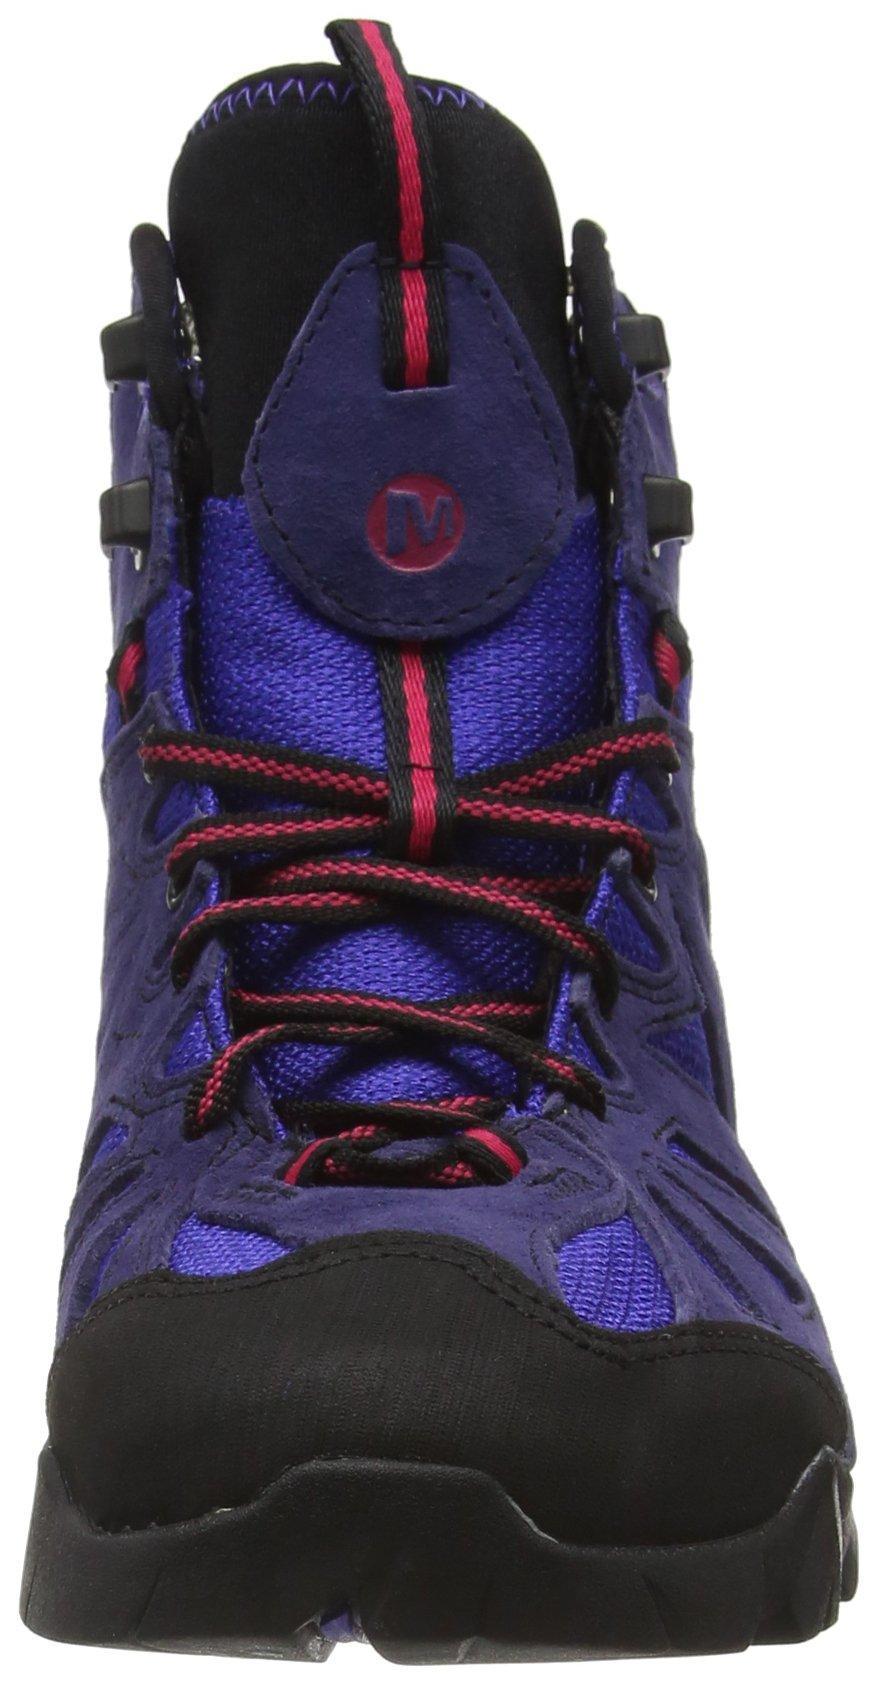 7a4eca29ae6 Merrell Women's Capra Mid Gore-tex High Rise Hiking Boots ...